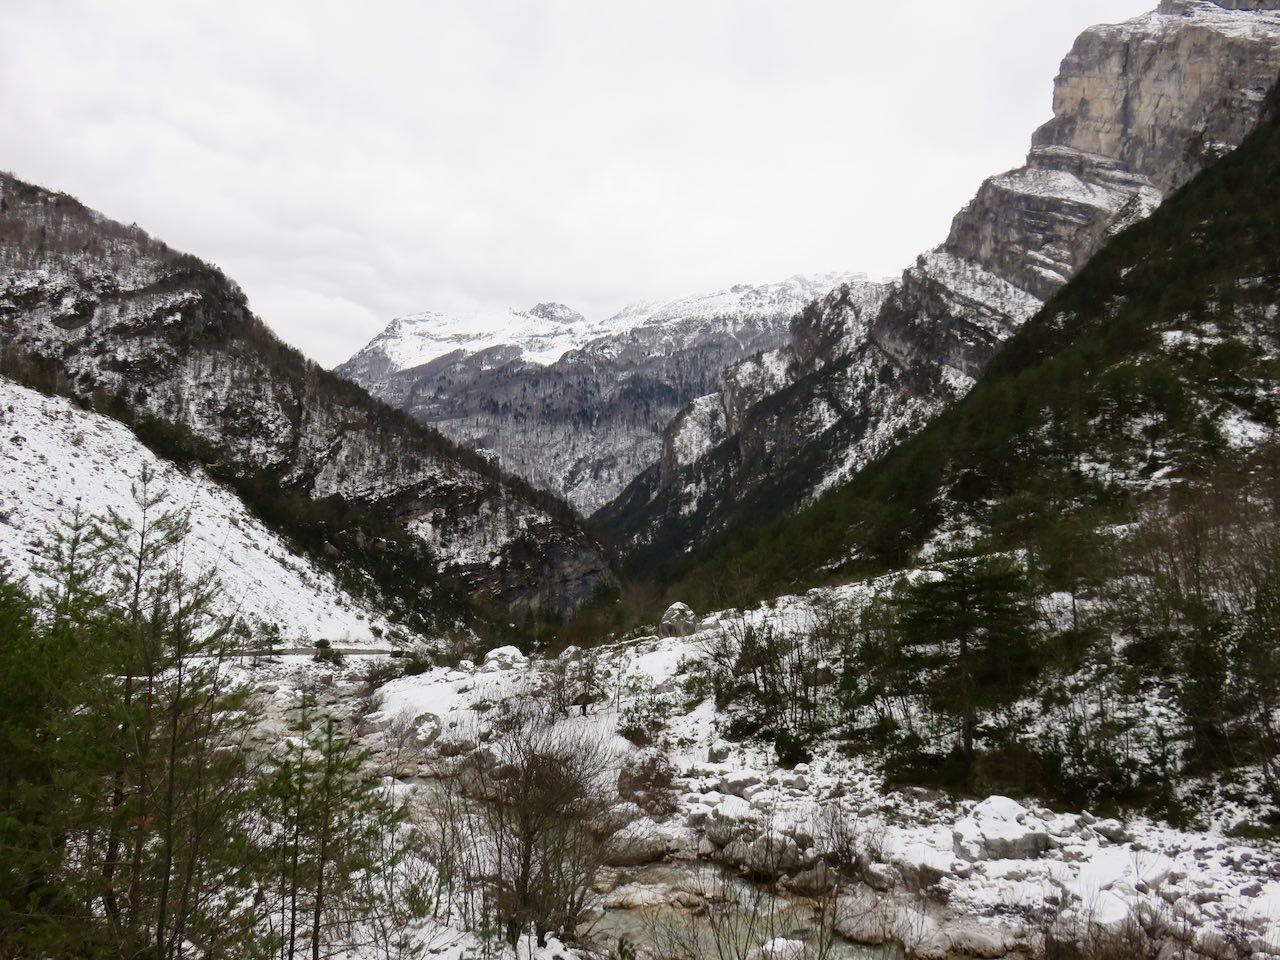 Val Cimoliana, Cimolais, Dolomiti, Dolomiti Friulane, Friuli